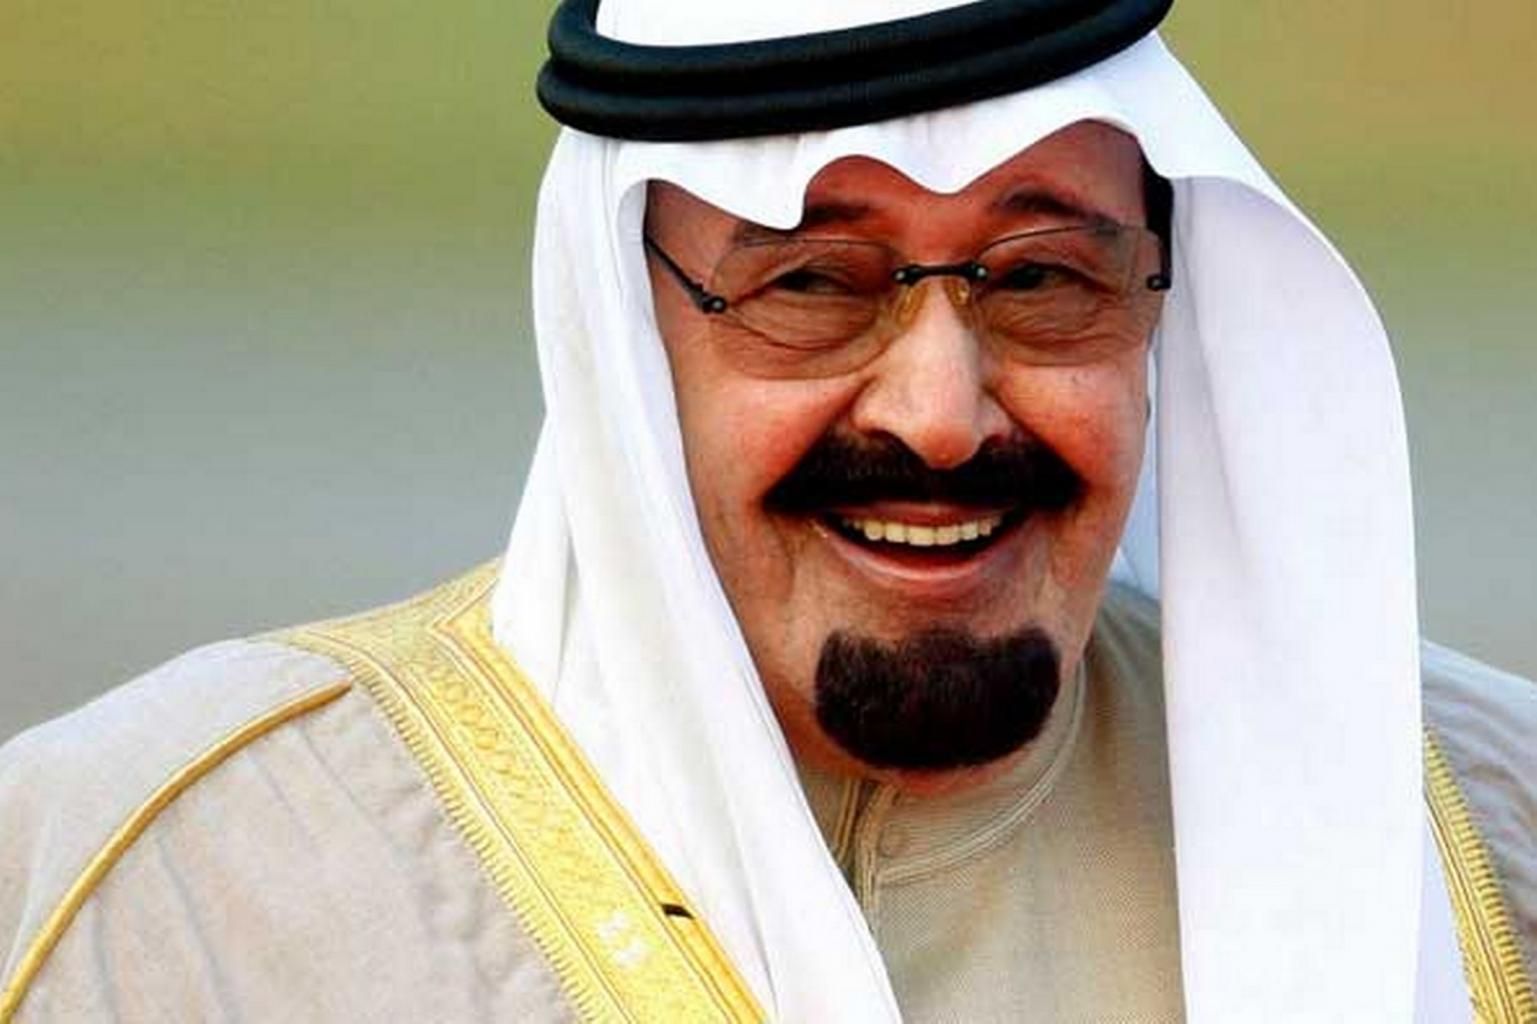 King Abdullah, King Of Saudi Arabia Is Dead - Or Is He